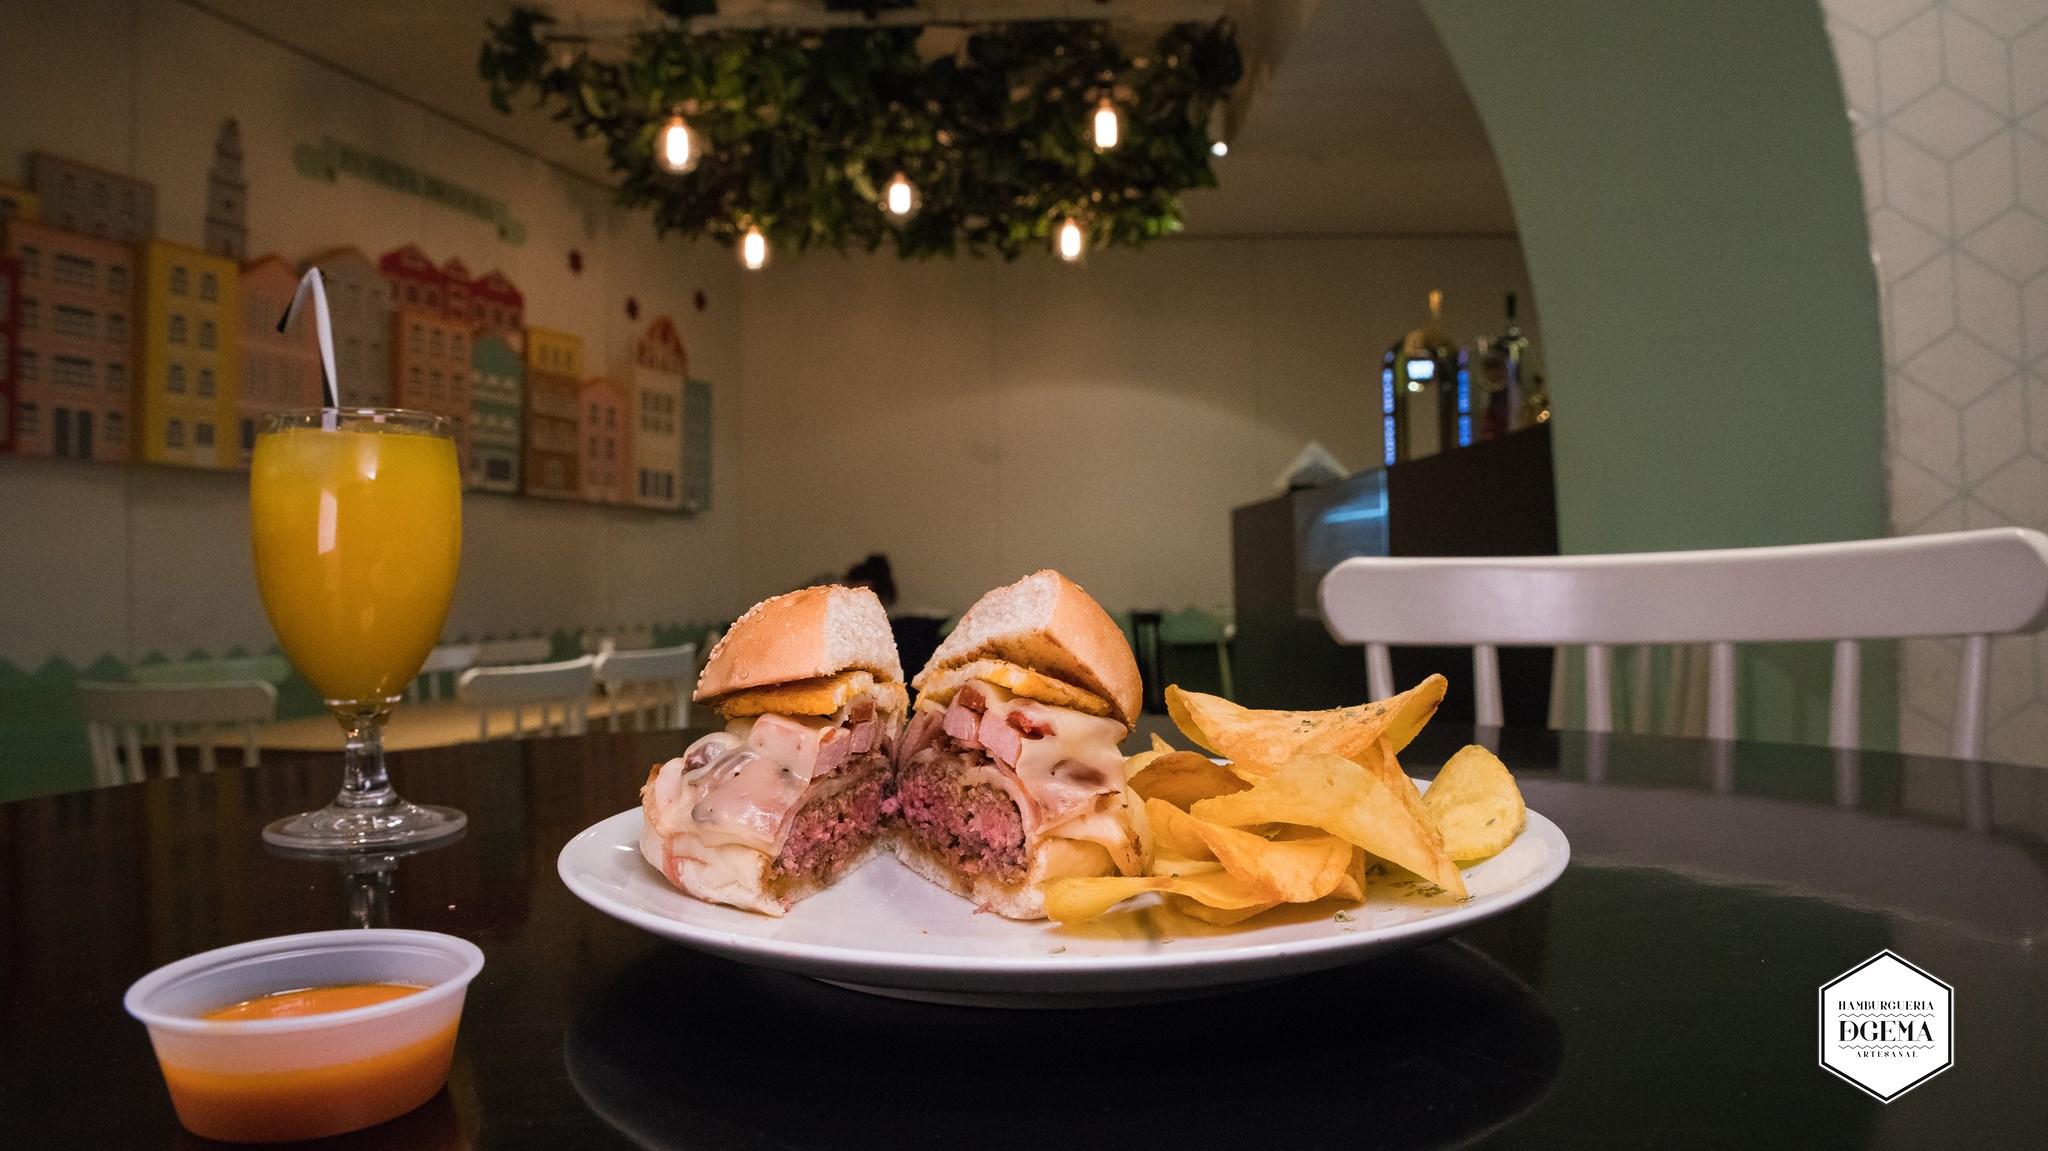 Hamburger de chez DeGema Hamburgueria Artesanal - Porto